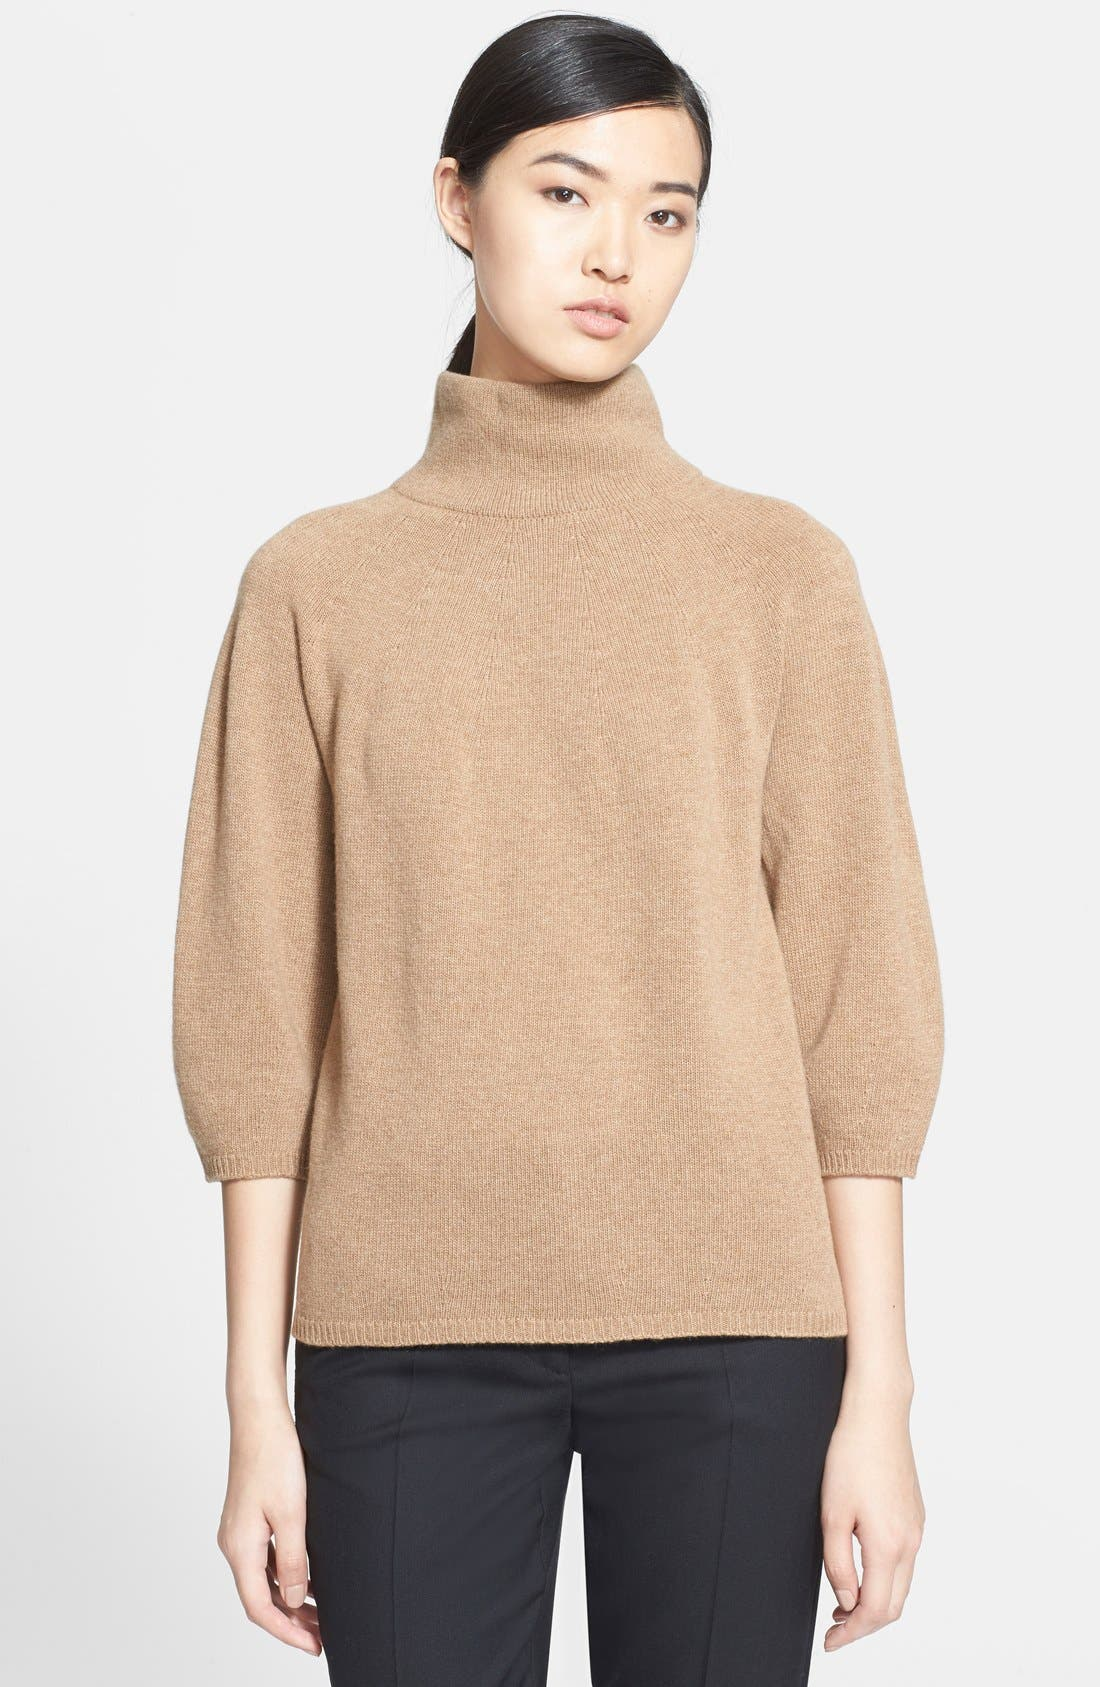 MAX MARA 'Anselmo' Wool & Cashmere Sweater, Main, color, 232